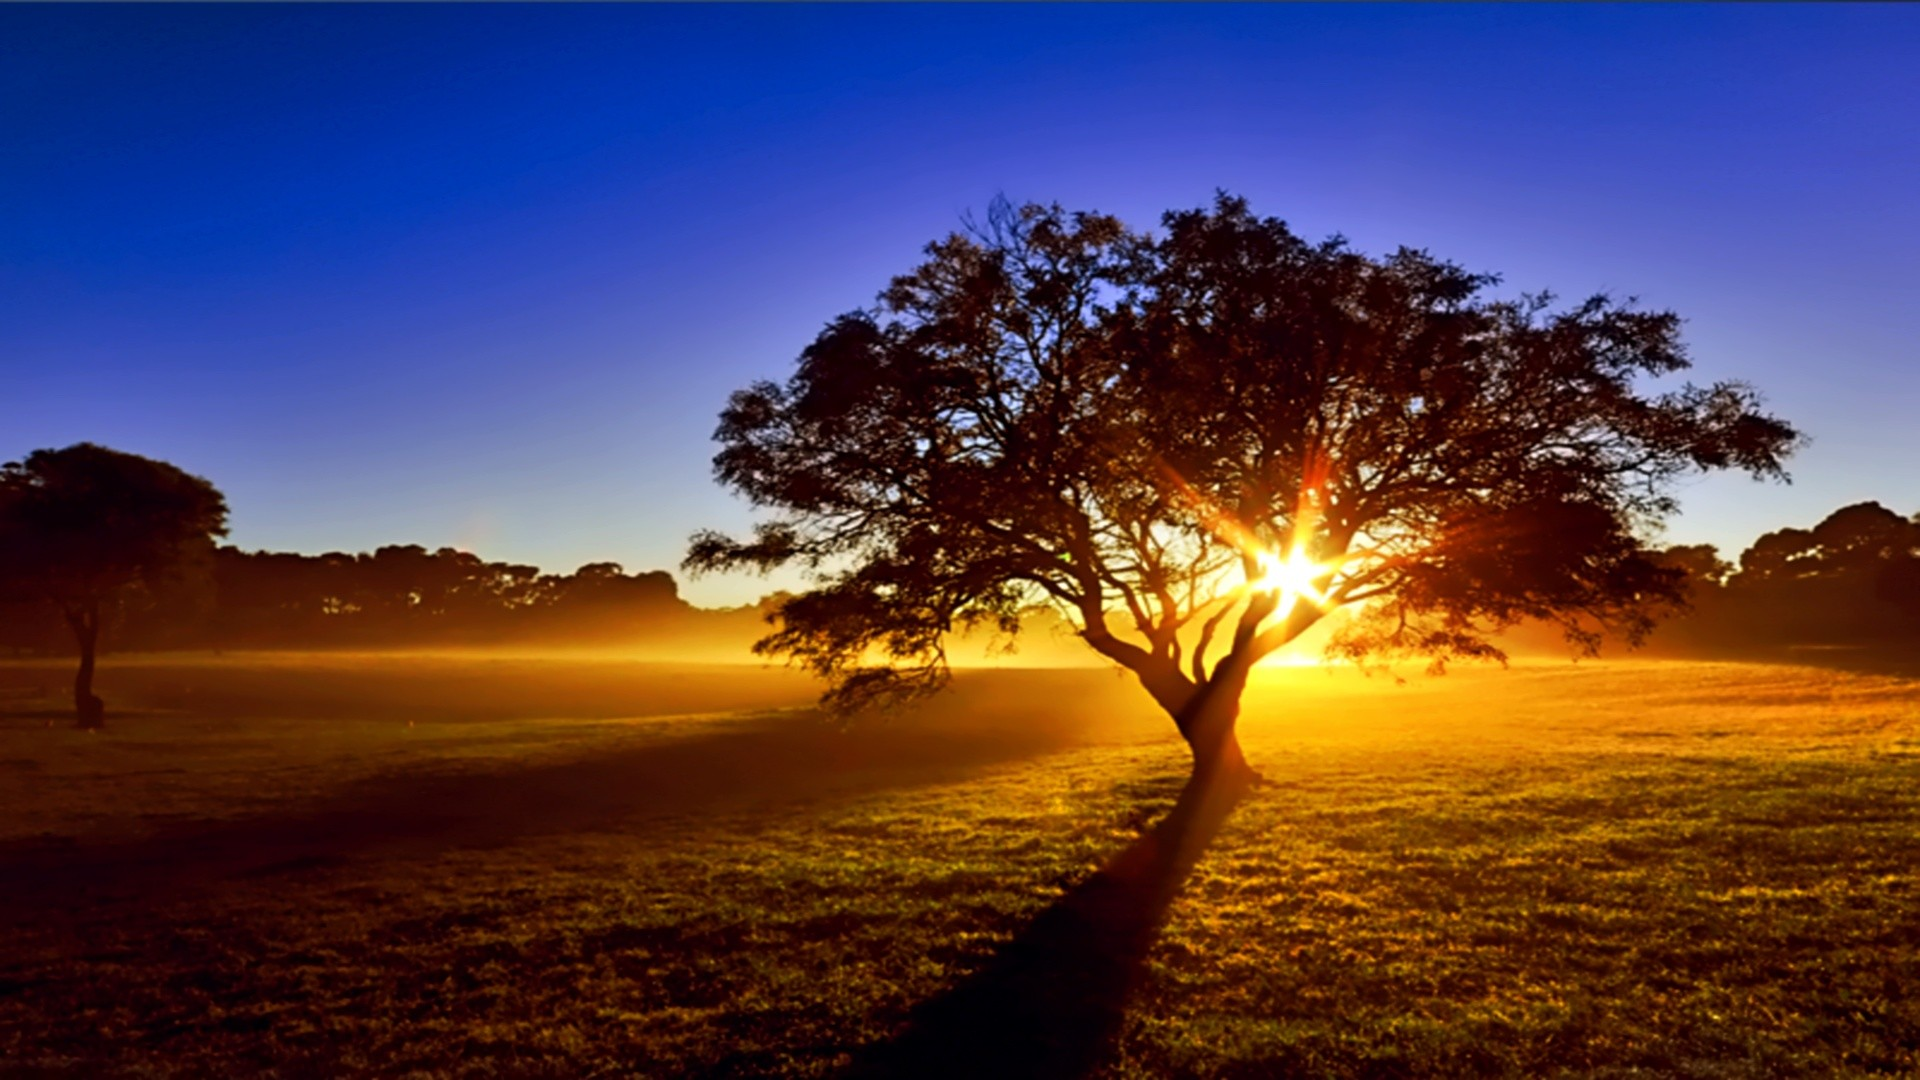 Sunset: Beauty Land Blue Nice Ray Trees Sunset Wallpaper For Ipad ...